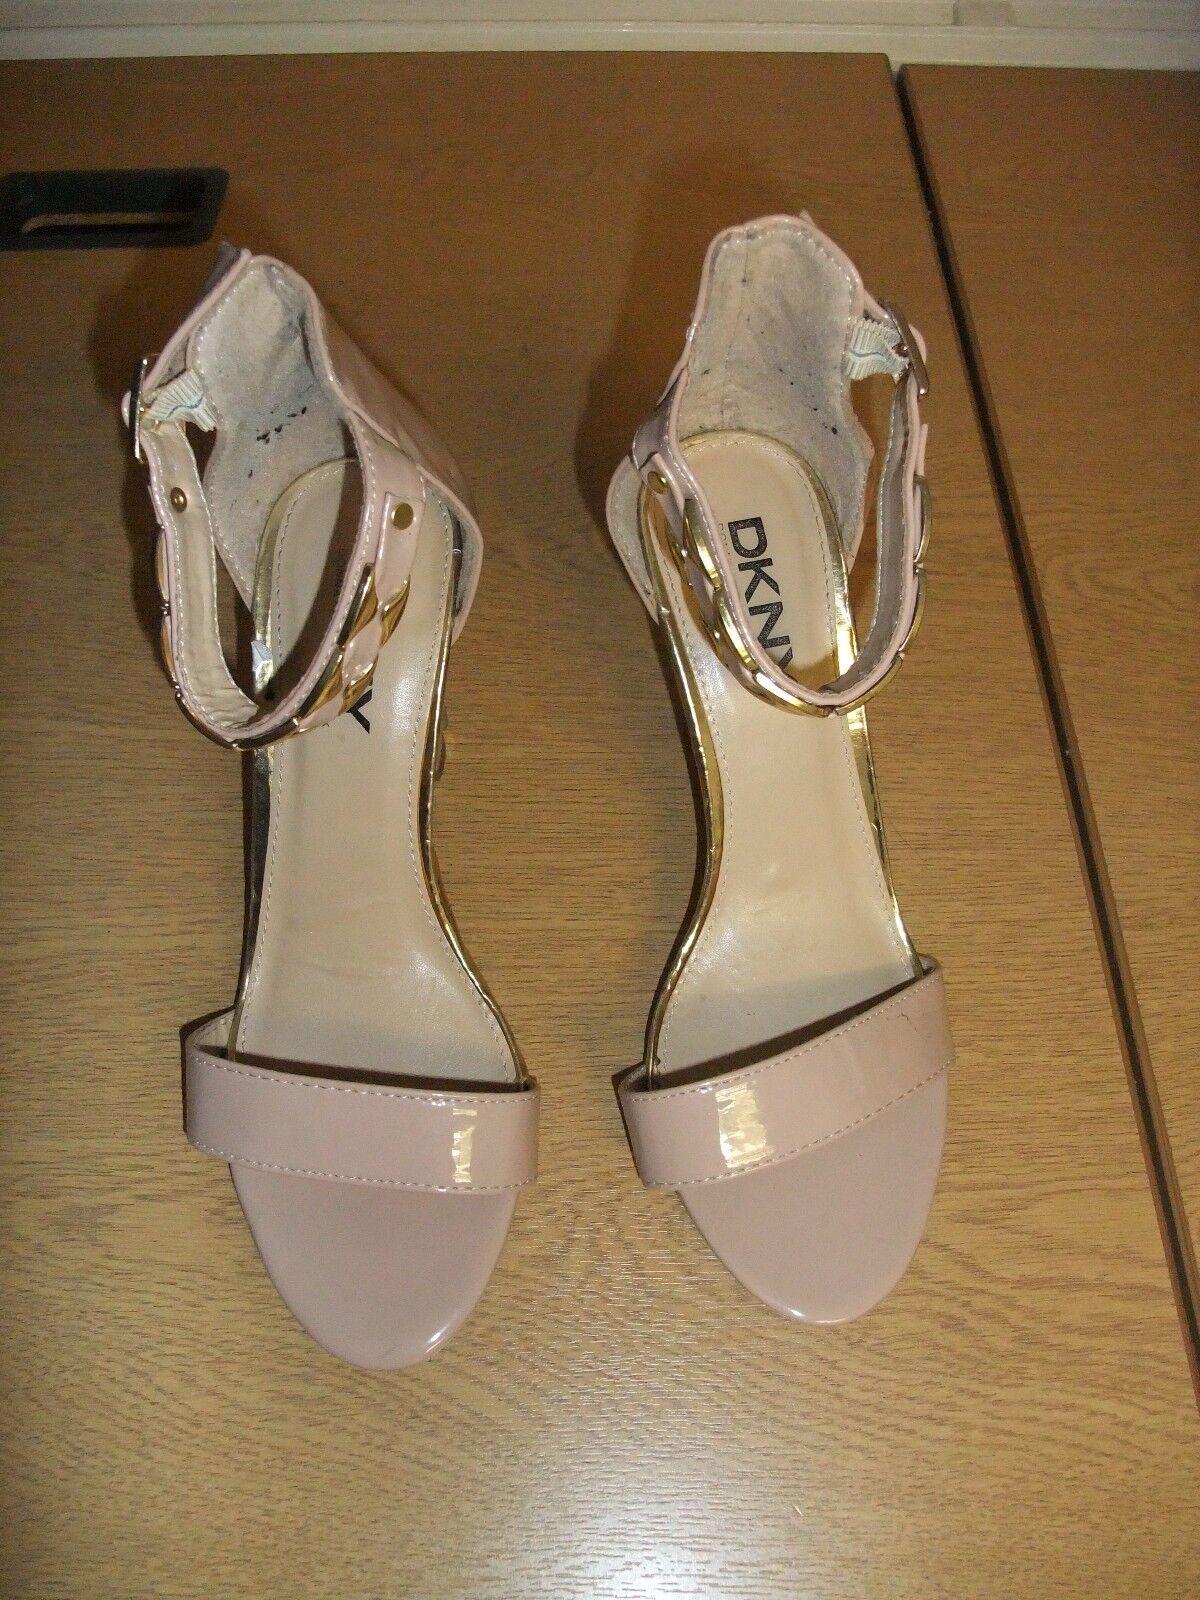 Scarpe DA DONNA DKNY nude in Pelle Tg EU party, 40, cinturino alla caviglia, party, EU usato 3211 095969